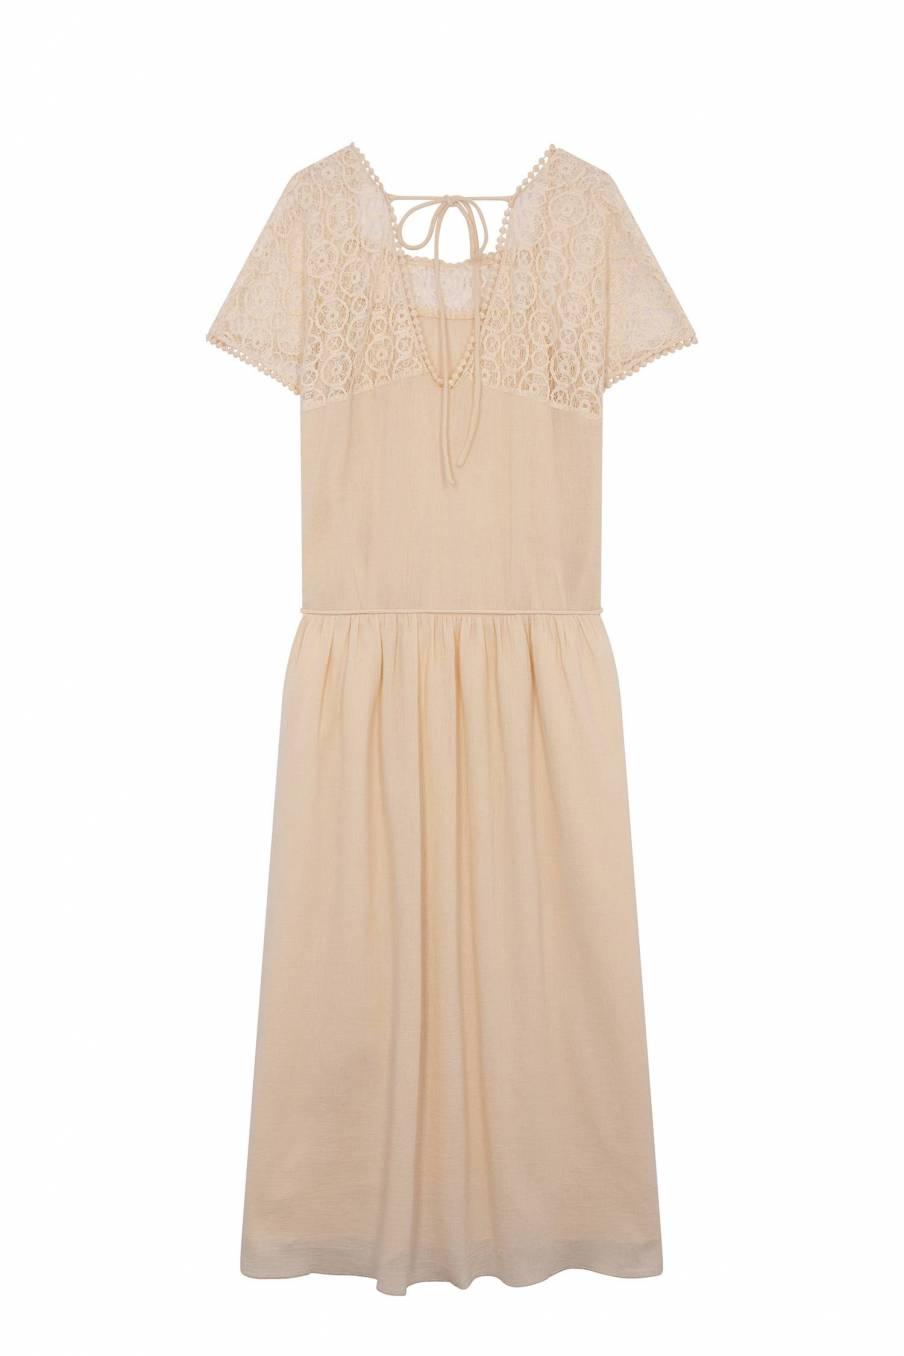 Dress Adela Cream